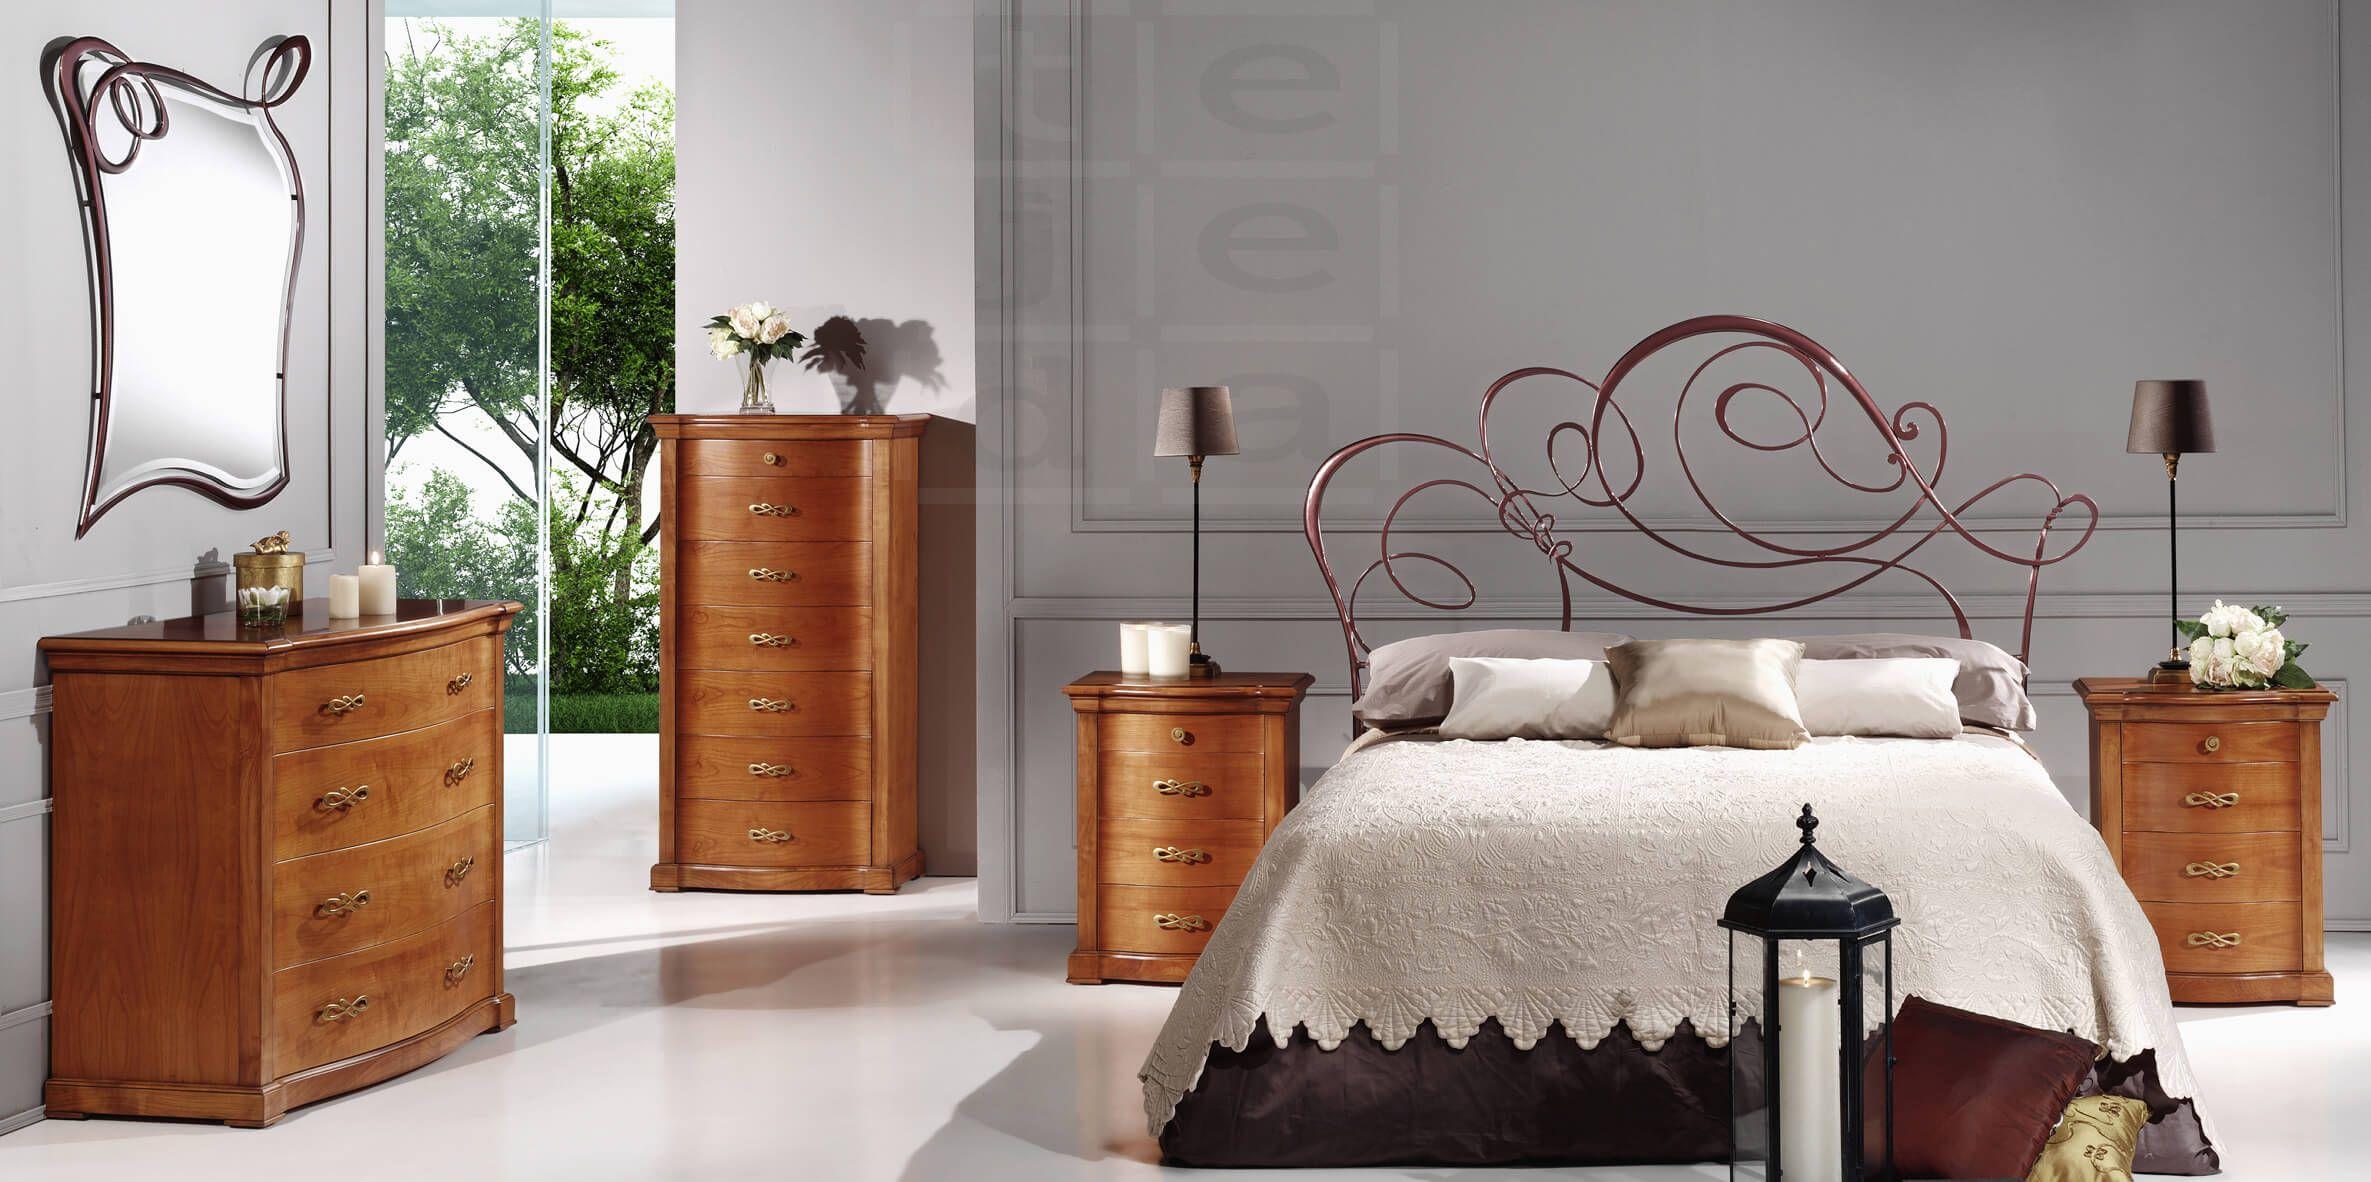 Cabecero Peña Vargas Modelo Diva Http Www Mueblestejeda Es Cabforja Cabecero Diva Php Furniture Home Decor Home